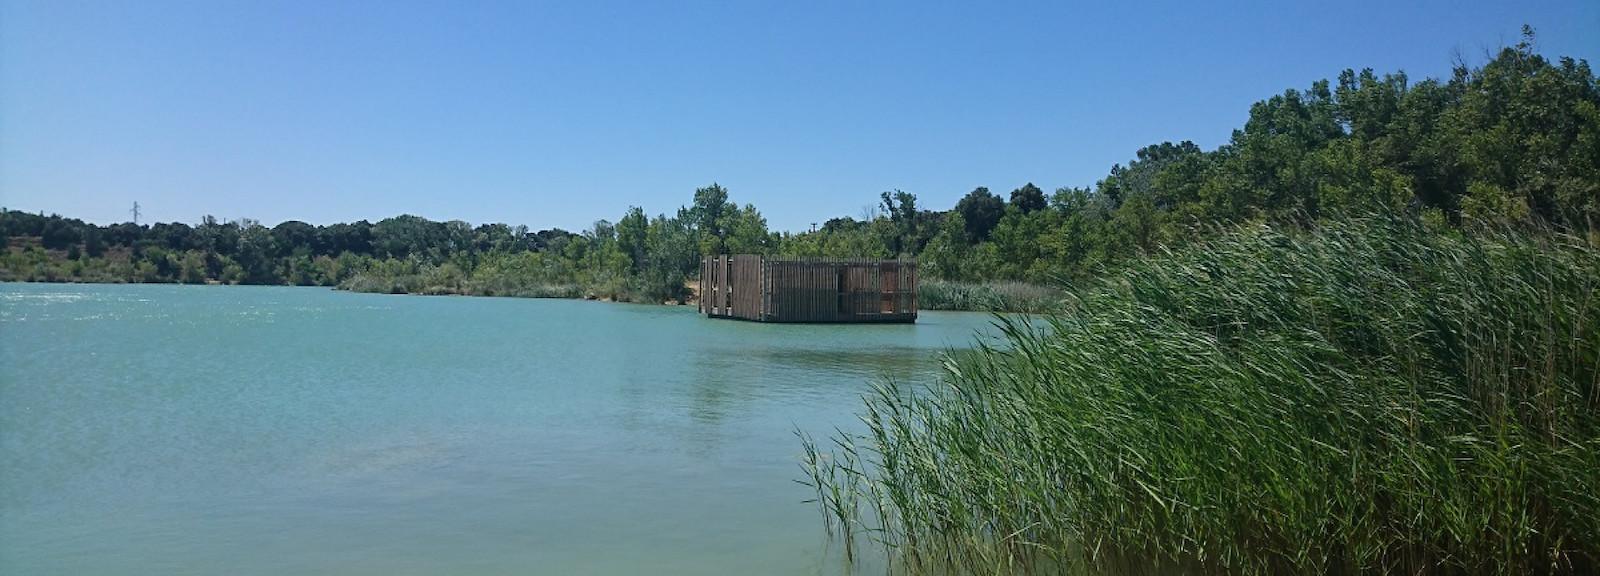 Supertrips - Drijvende hut in de Vaucluse